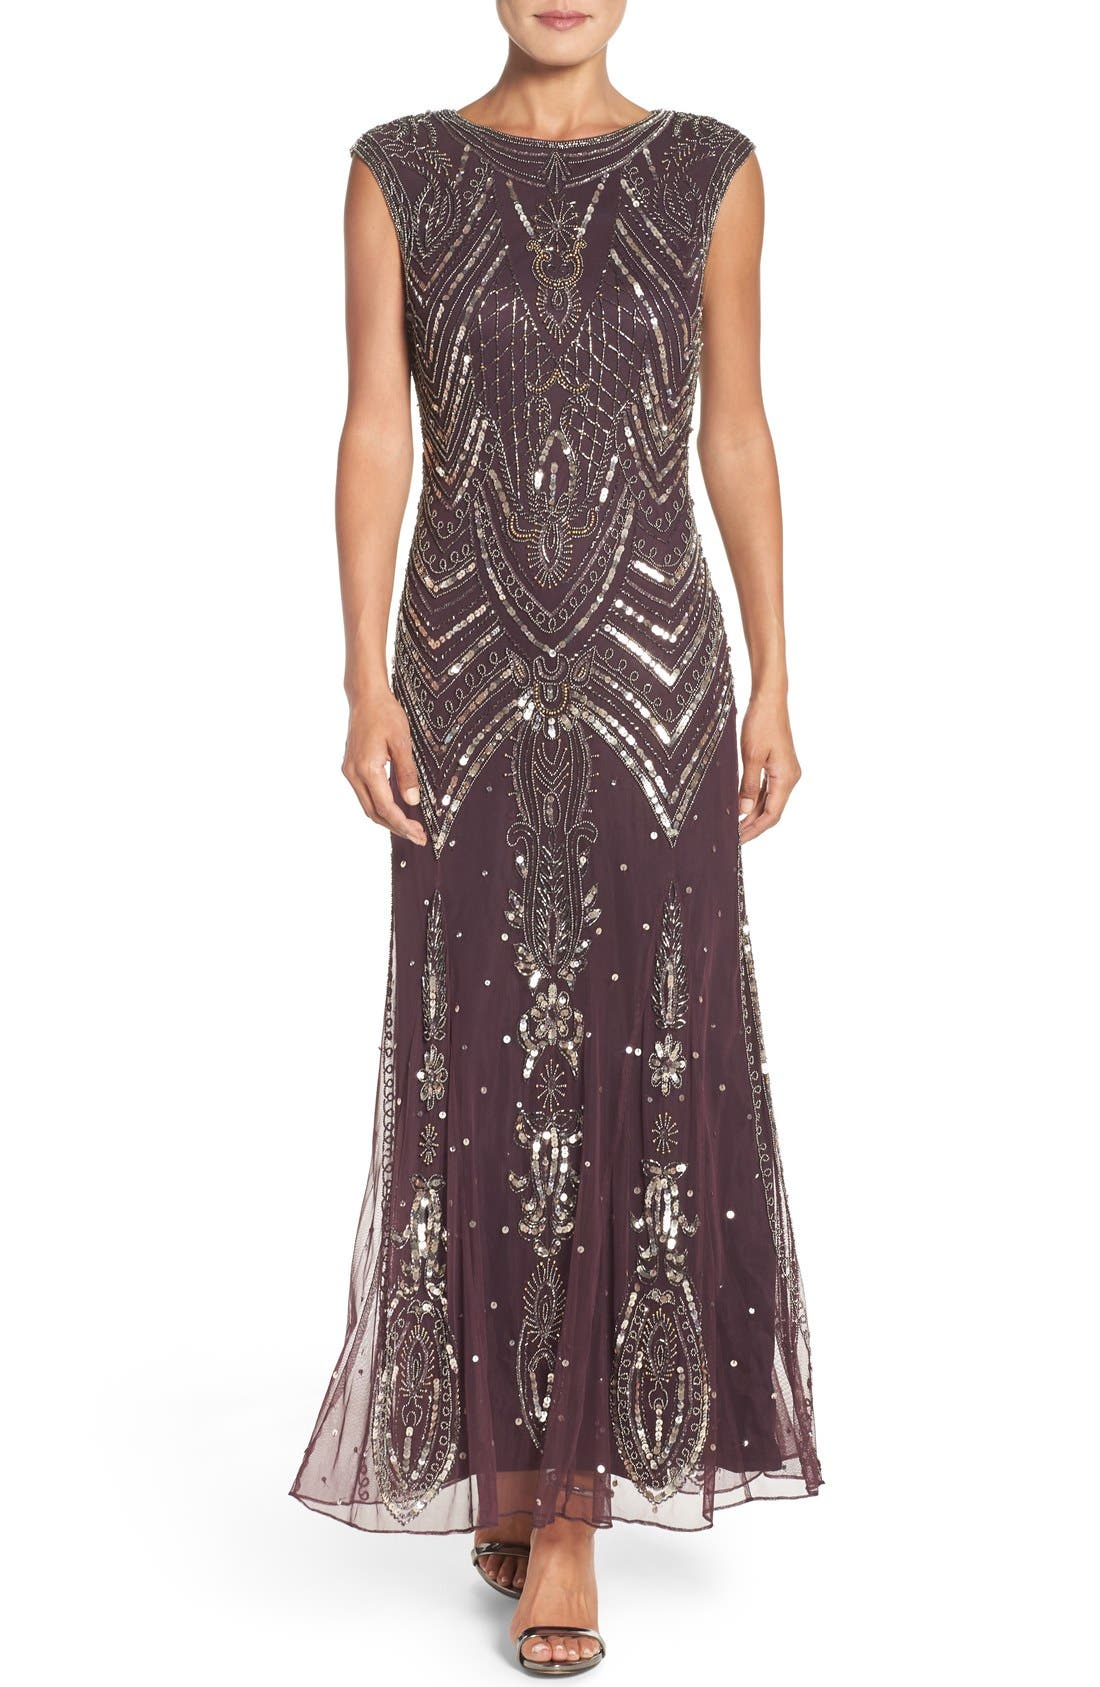 Alternate Image 1 Selected - Pisarro Nights Embellished Gown (Regular & Petite)